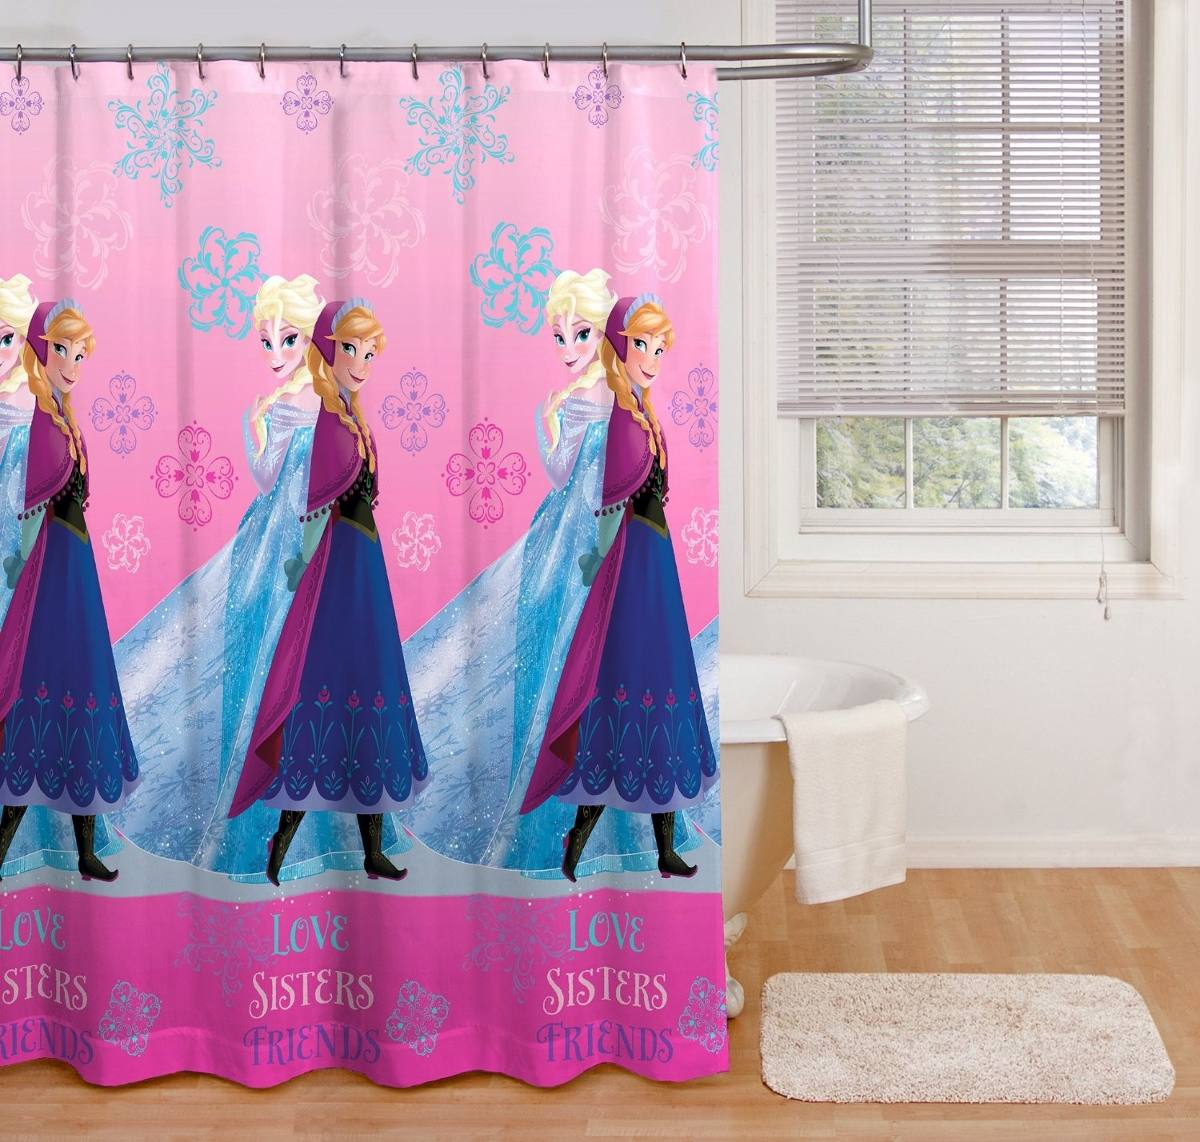 Baño Para Jardin Infantil:Cortinas Para Baño Infantil Disney Frozen – $ 38000 en MercadoLibre